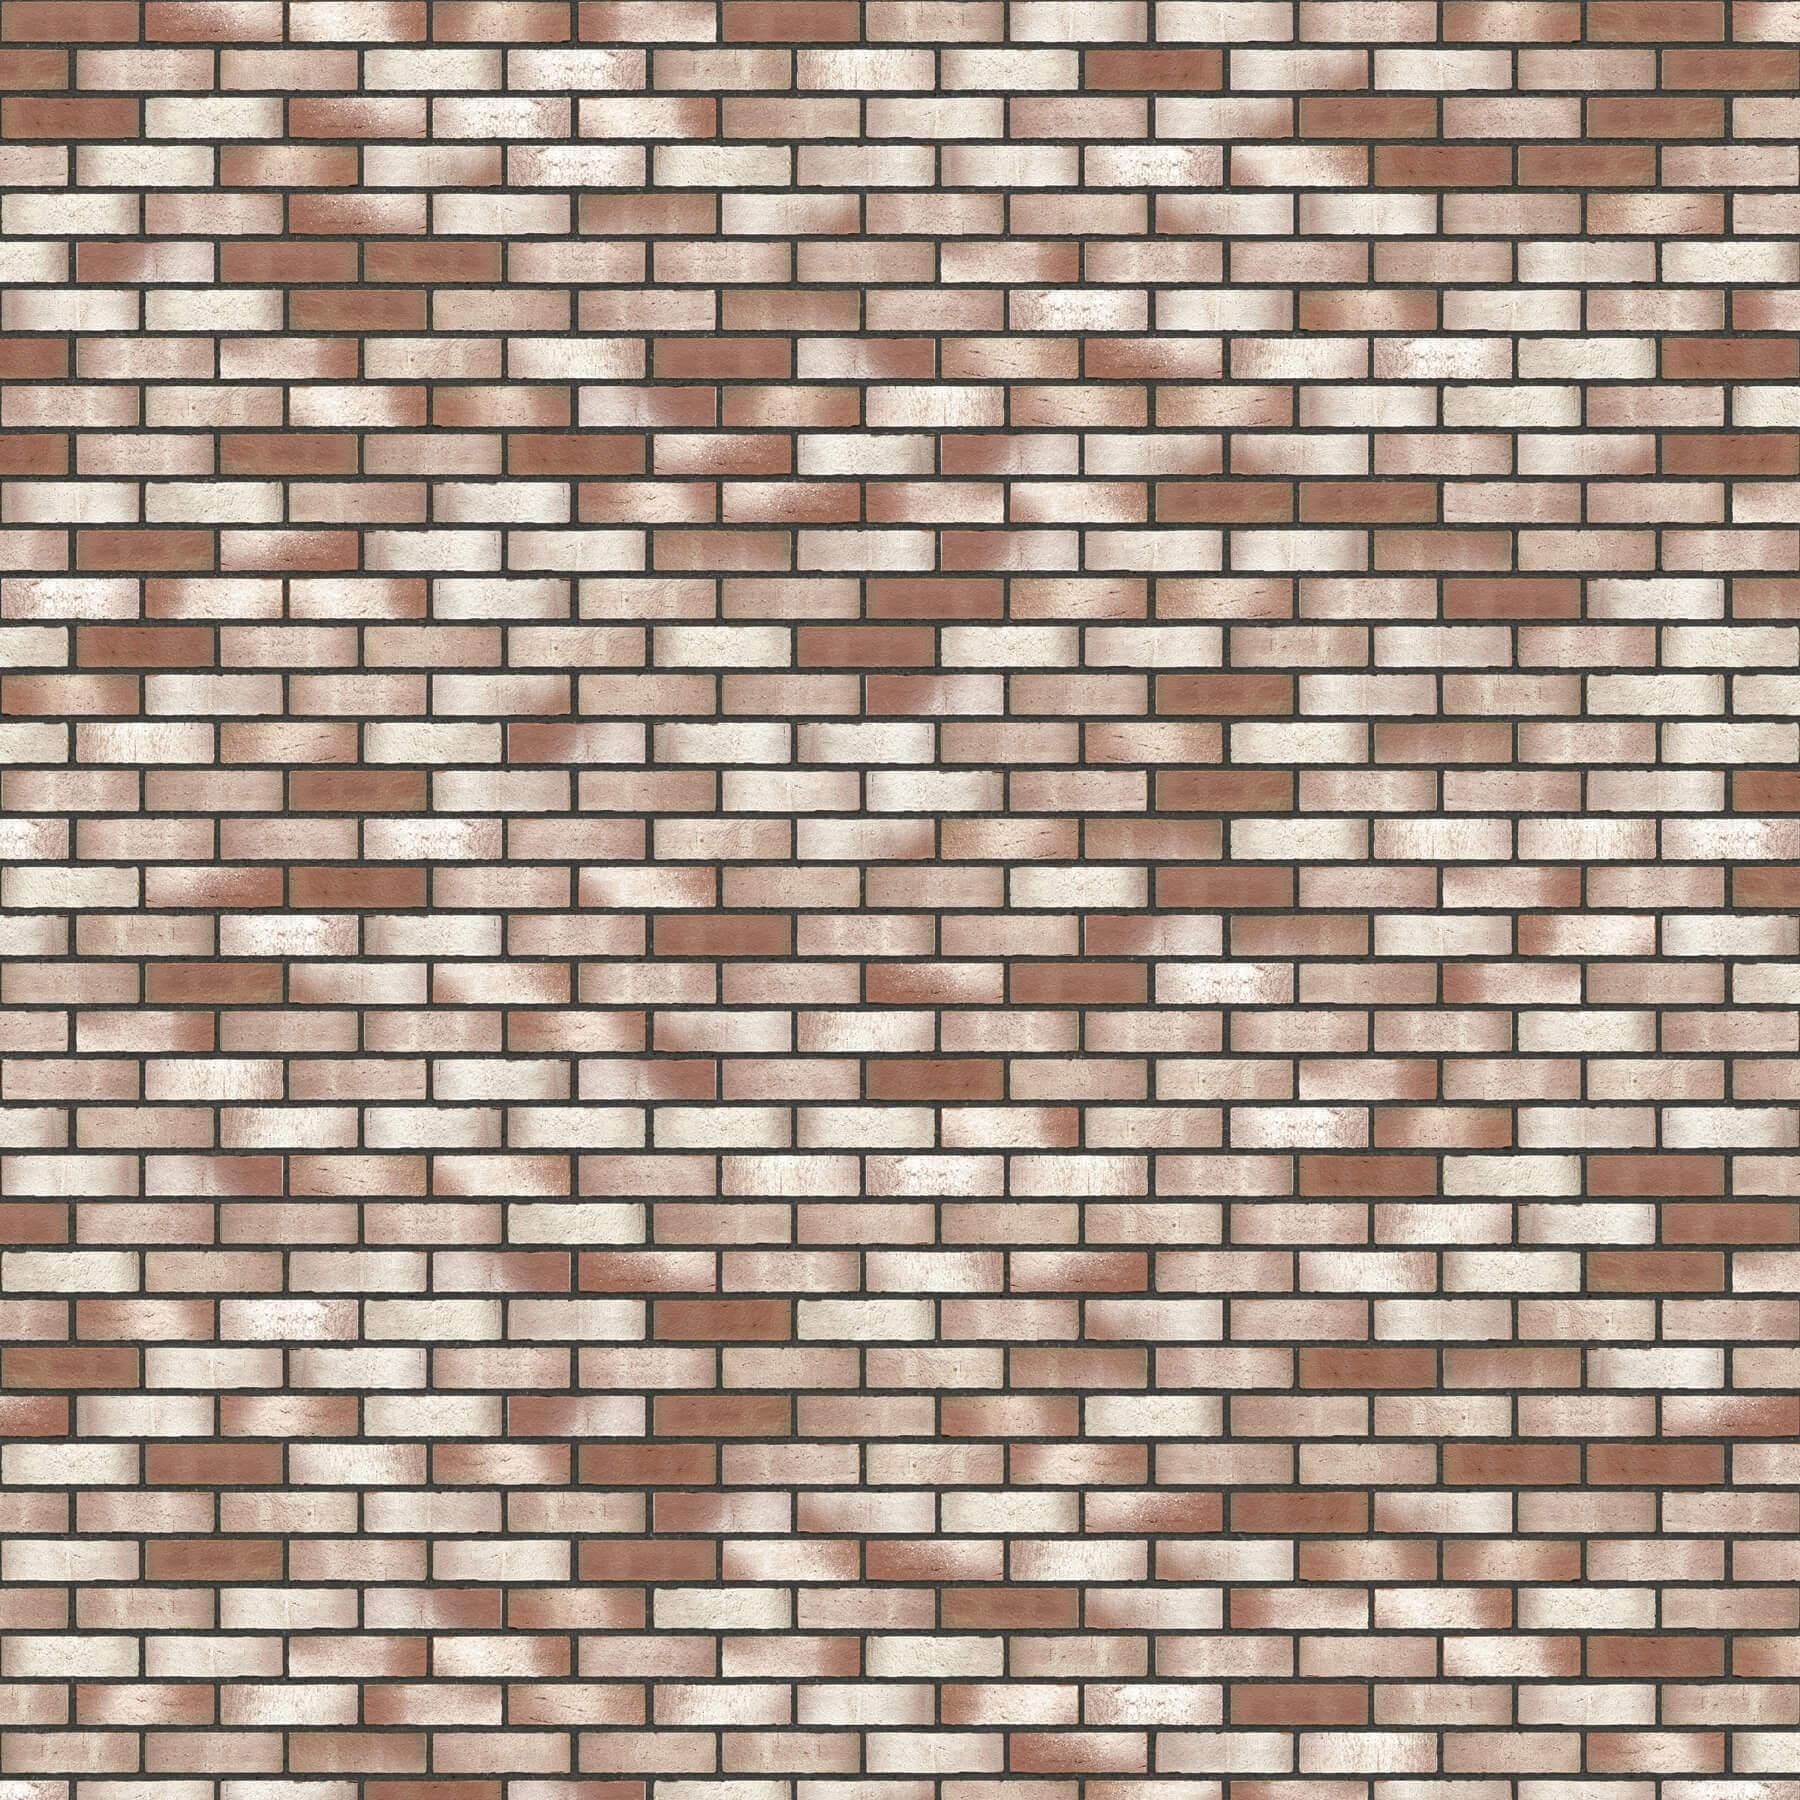 Puna-cigla-FeldHaus-Klinker-brick-house-beograd-nf-k-923-Antracit Fuga